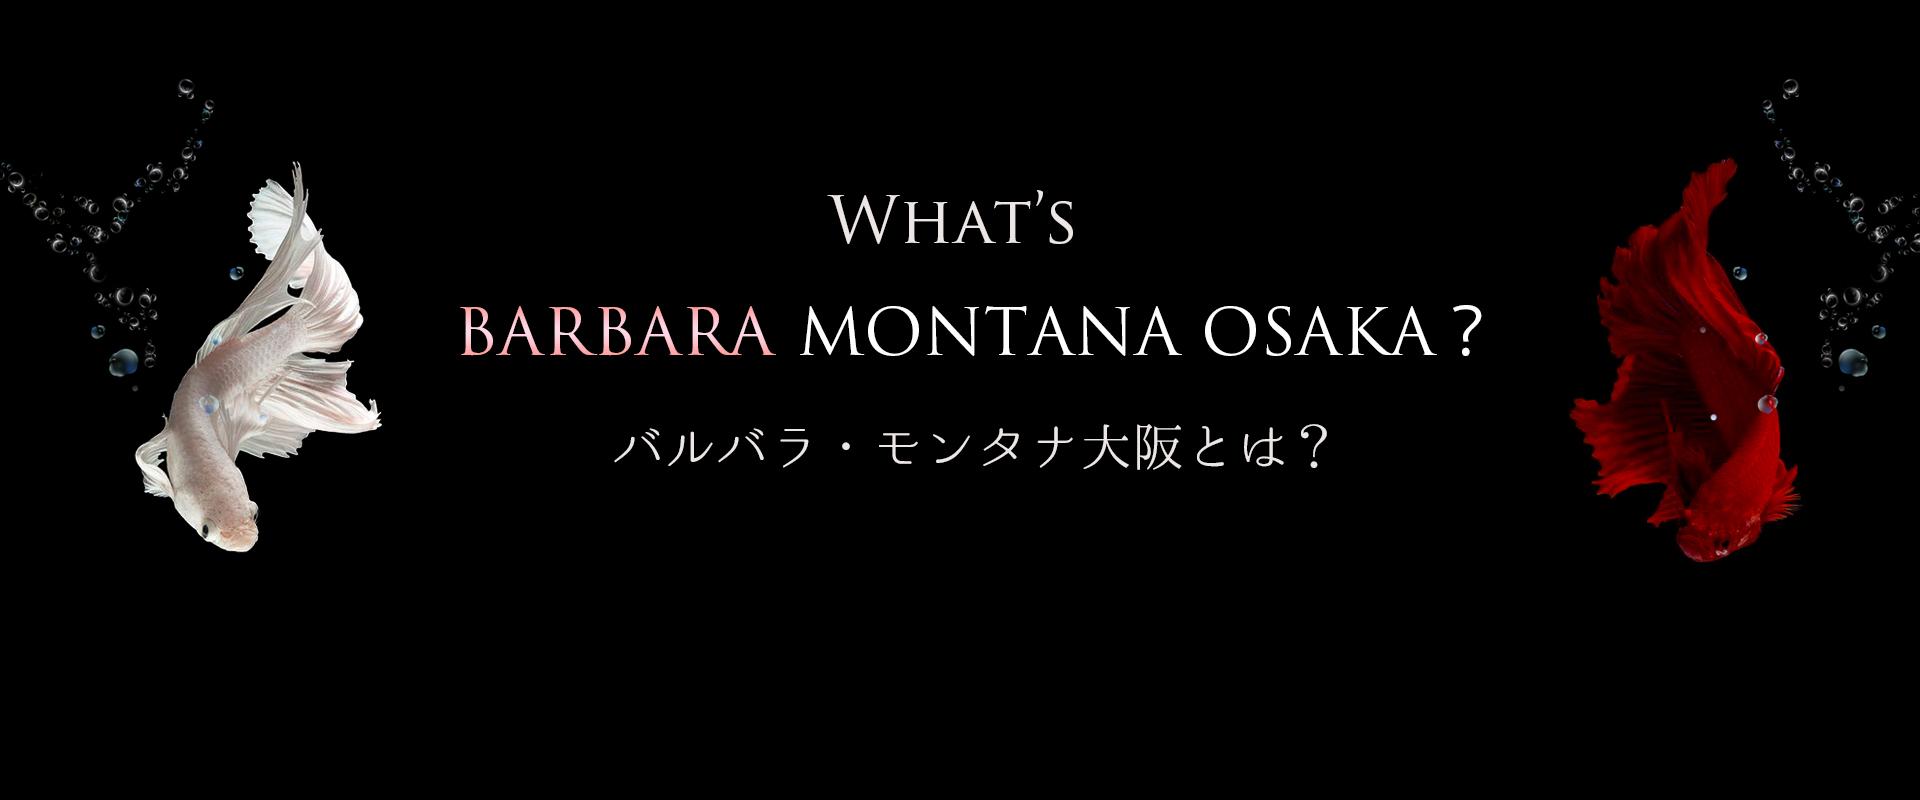 What's CHARLES MONTANA?